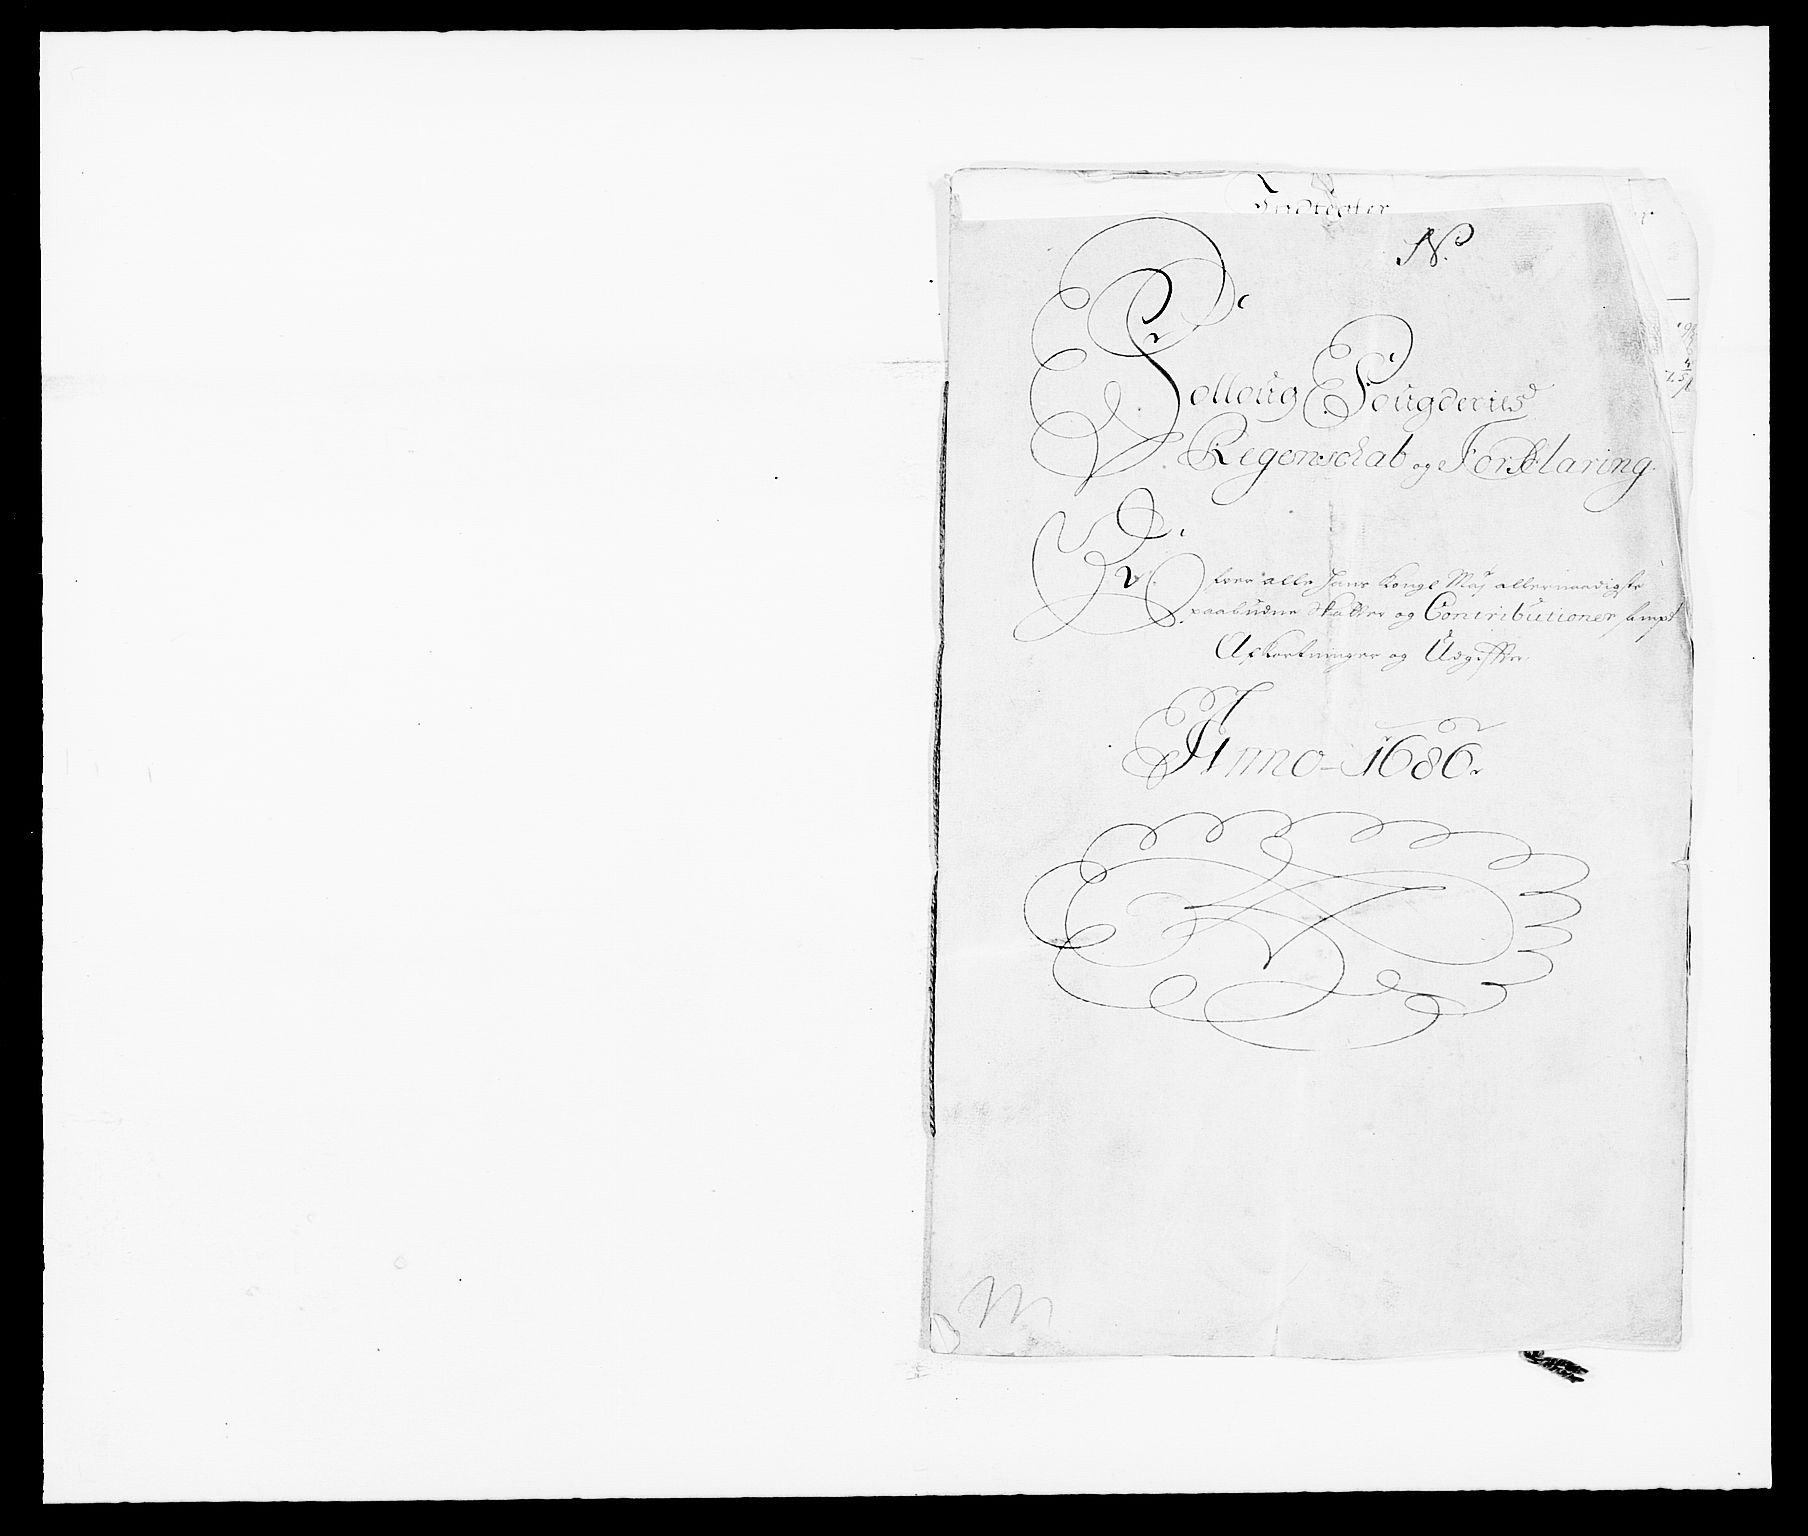 RA, Rentekammeret inntil 1814, Reviderte regnskaper, Fogderegnskap, R09/L0433: Fogderegnskap Follo, 1685-1686, s. 237